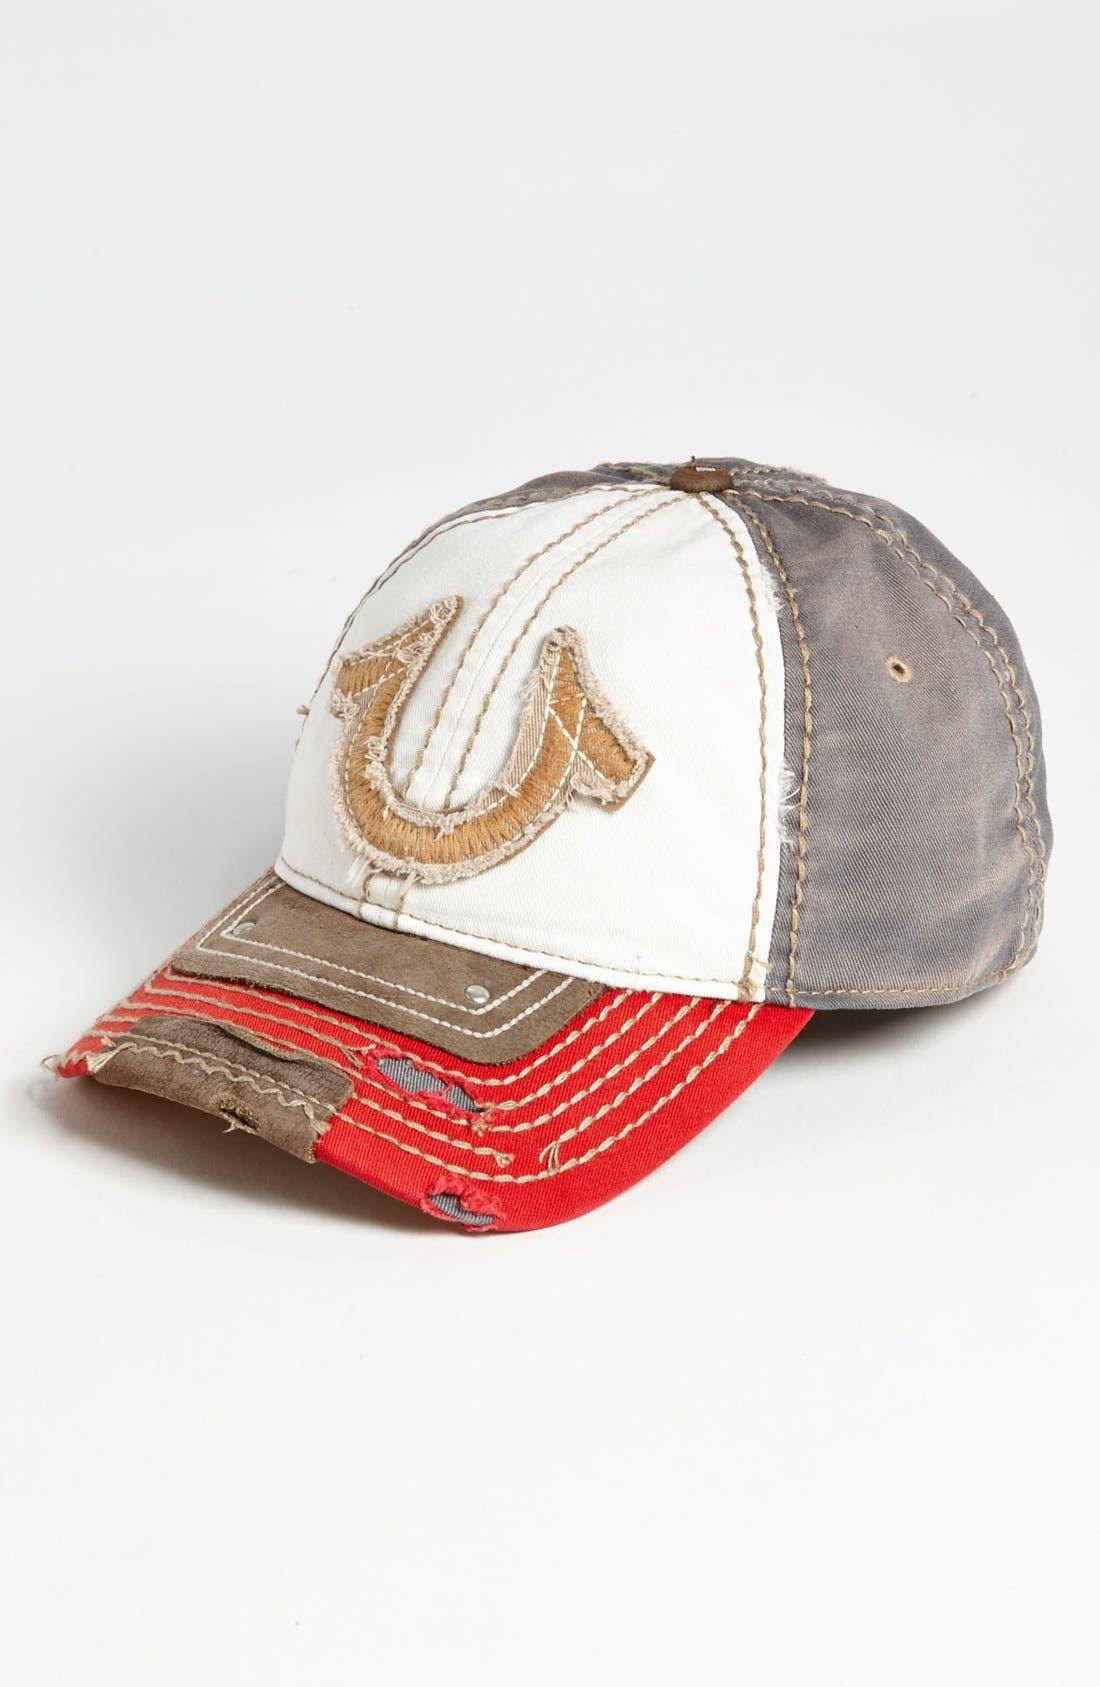 Main Image - True Religion Brand Jeans 'Vintage Horseshoe' Baseball Cap